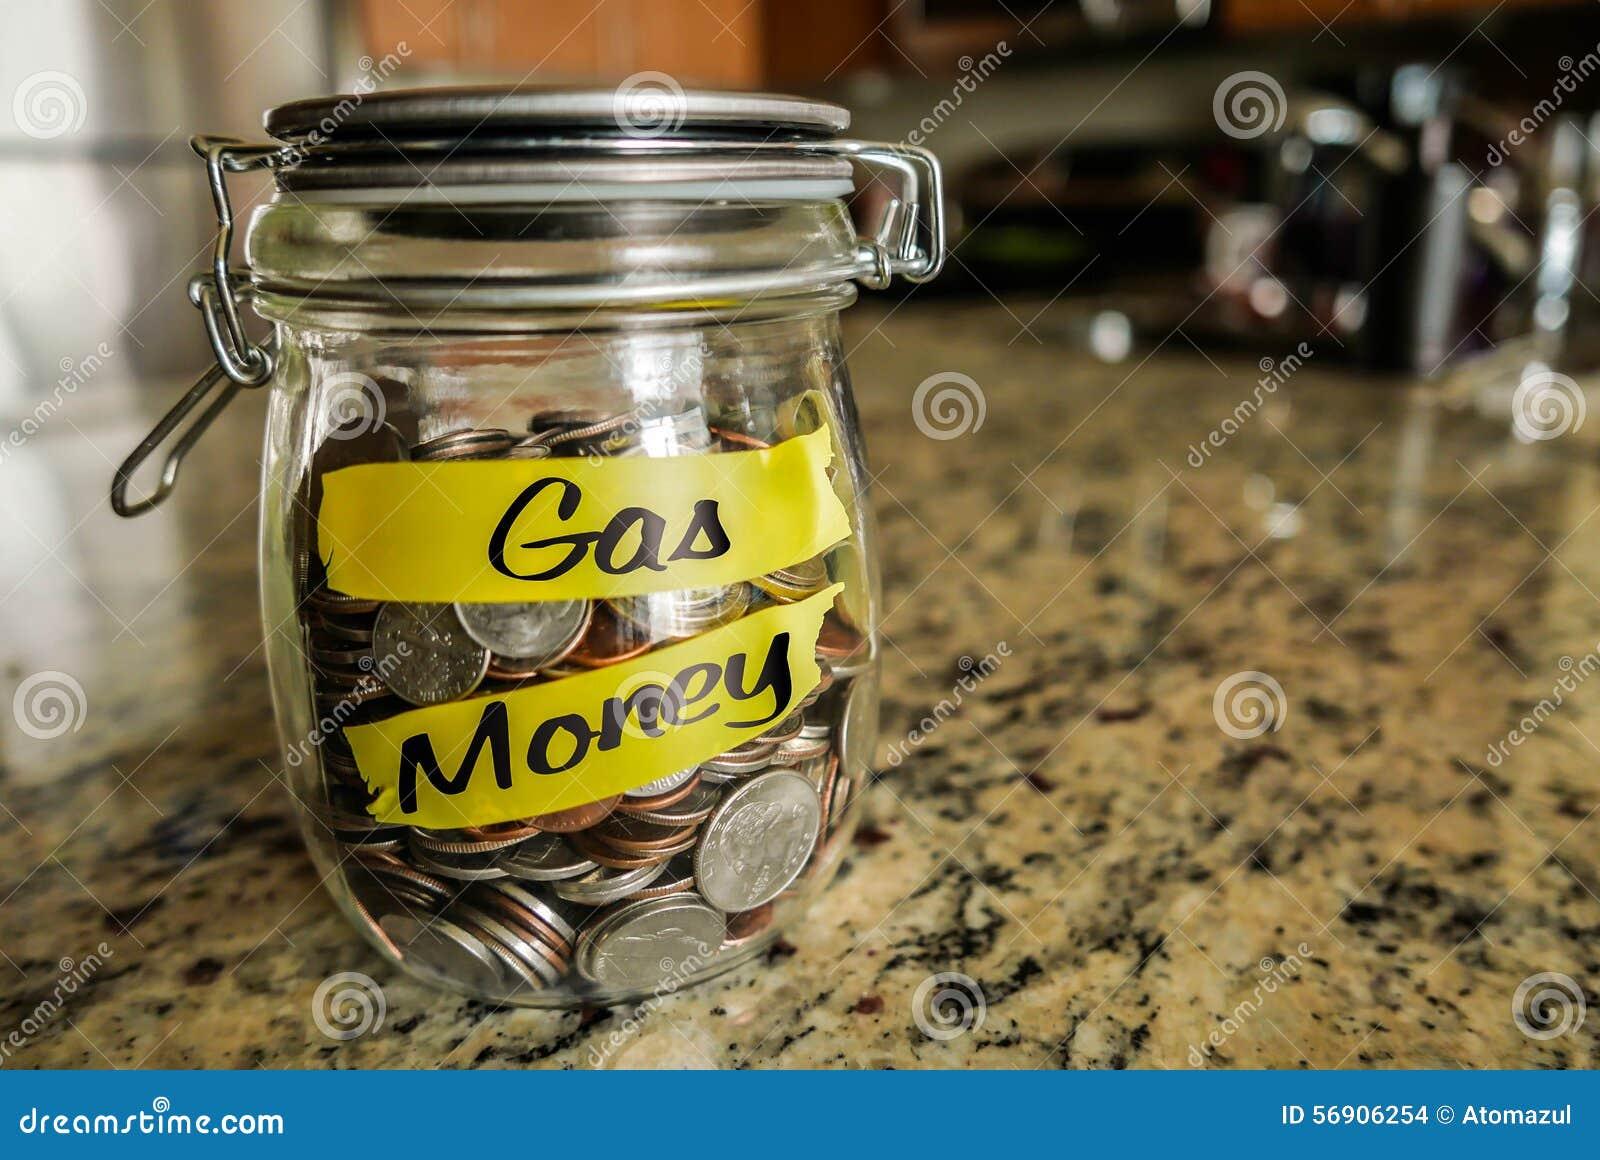 Tarro del dinero del gas